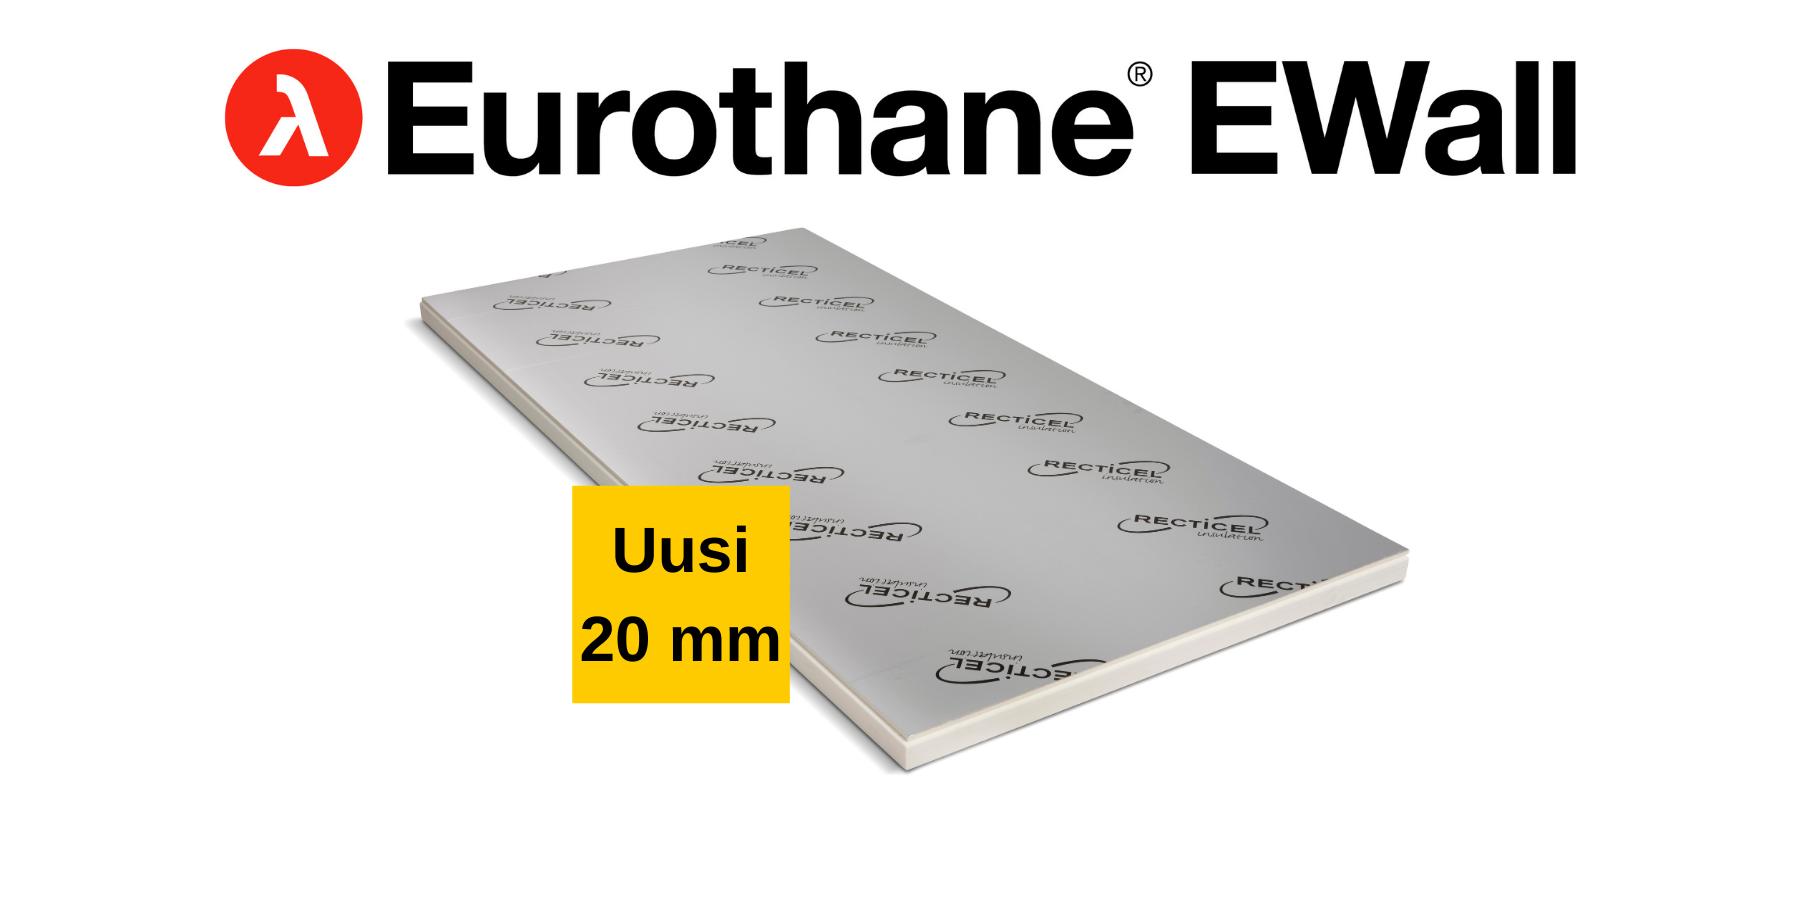 Eurothane EWall